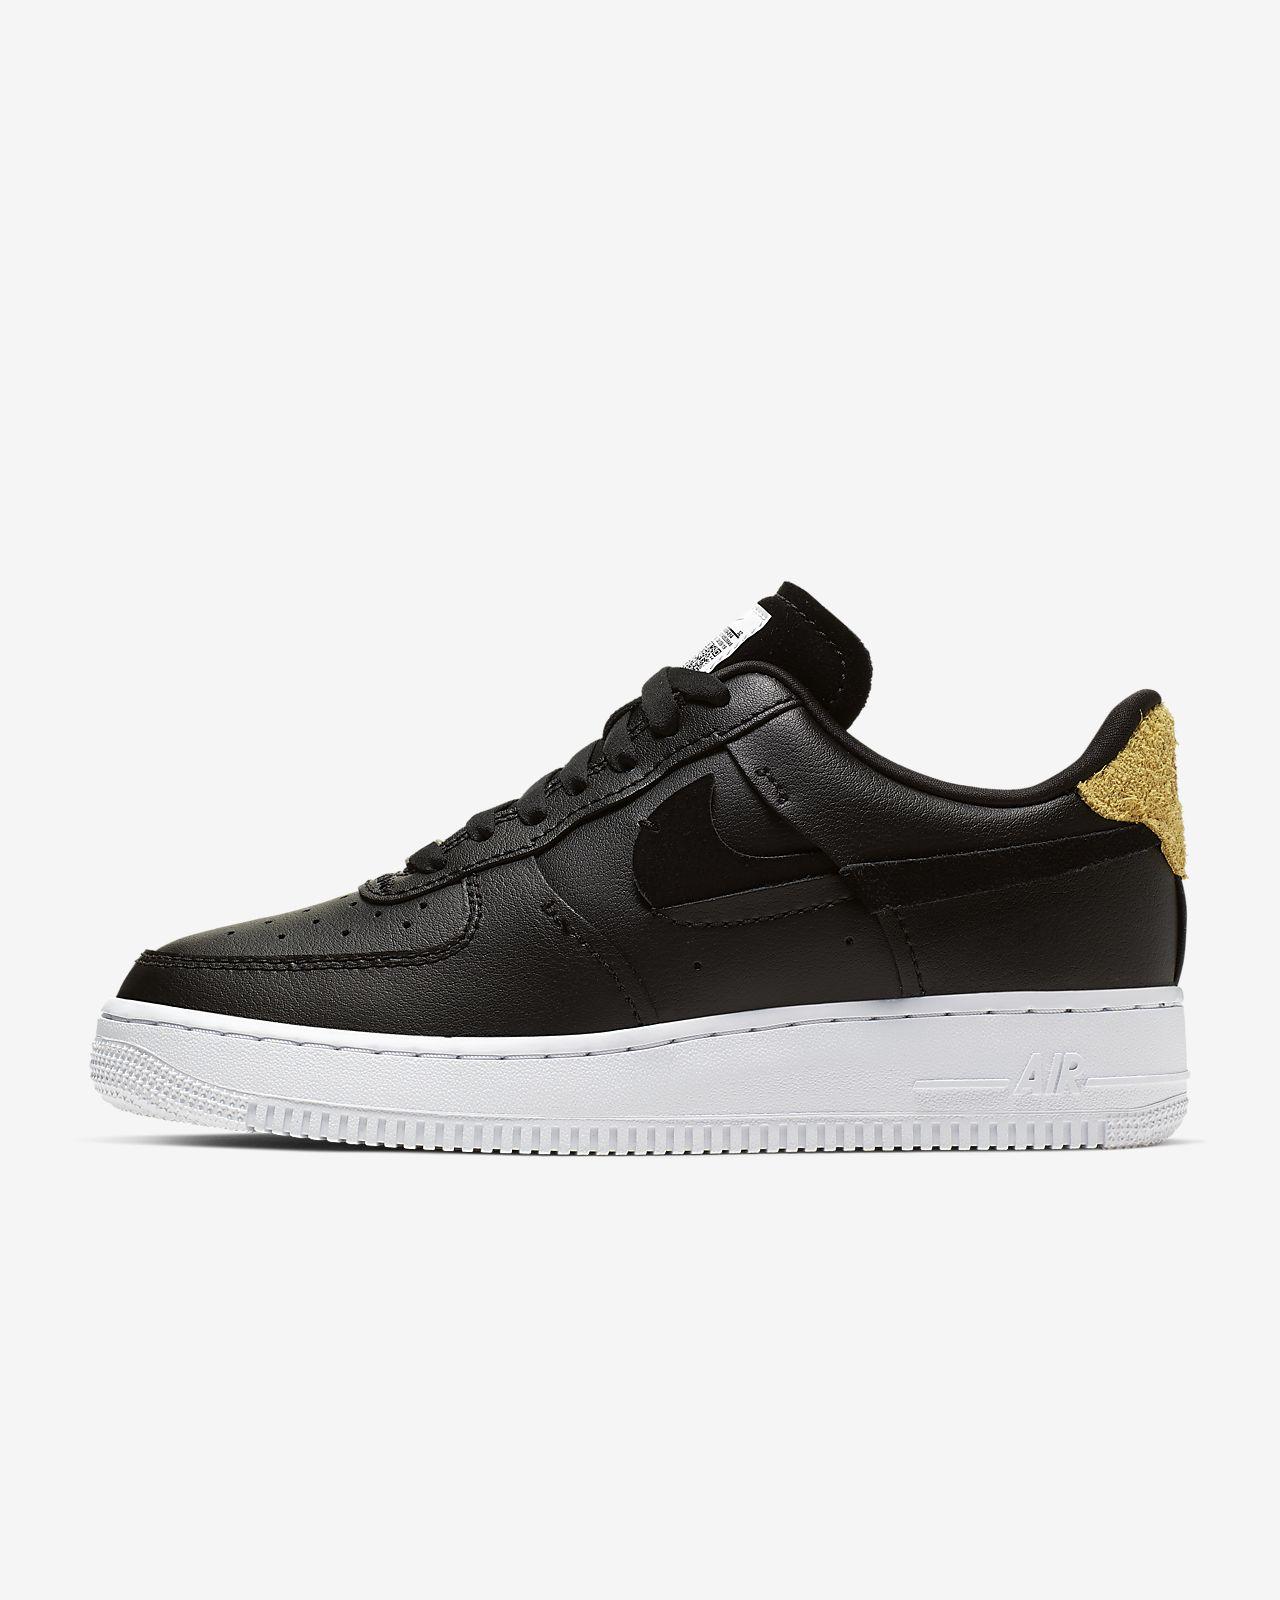 Nike Air Force 1 '07 Lux női cipő